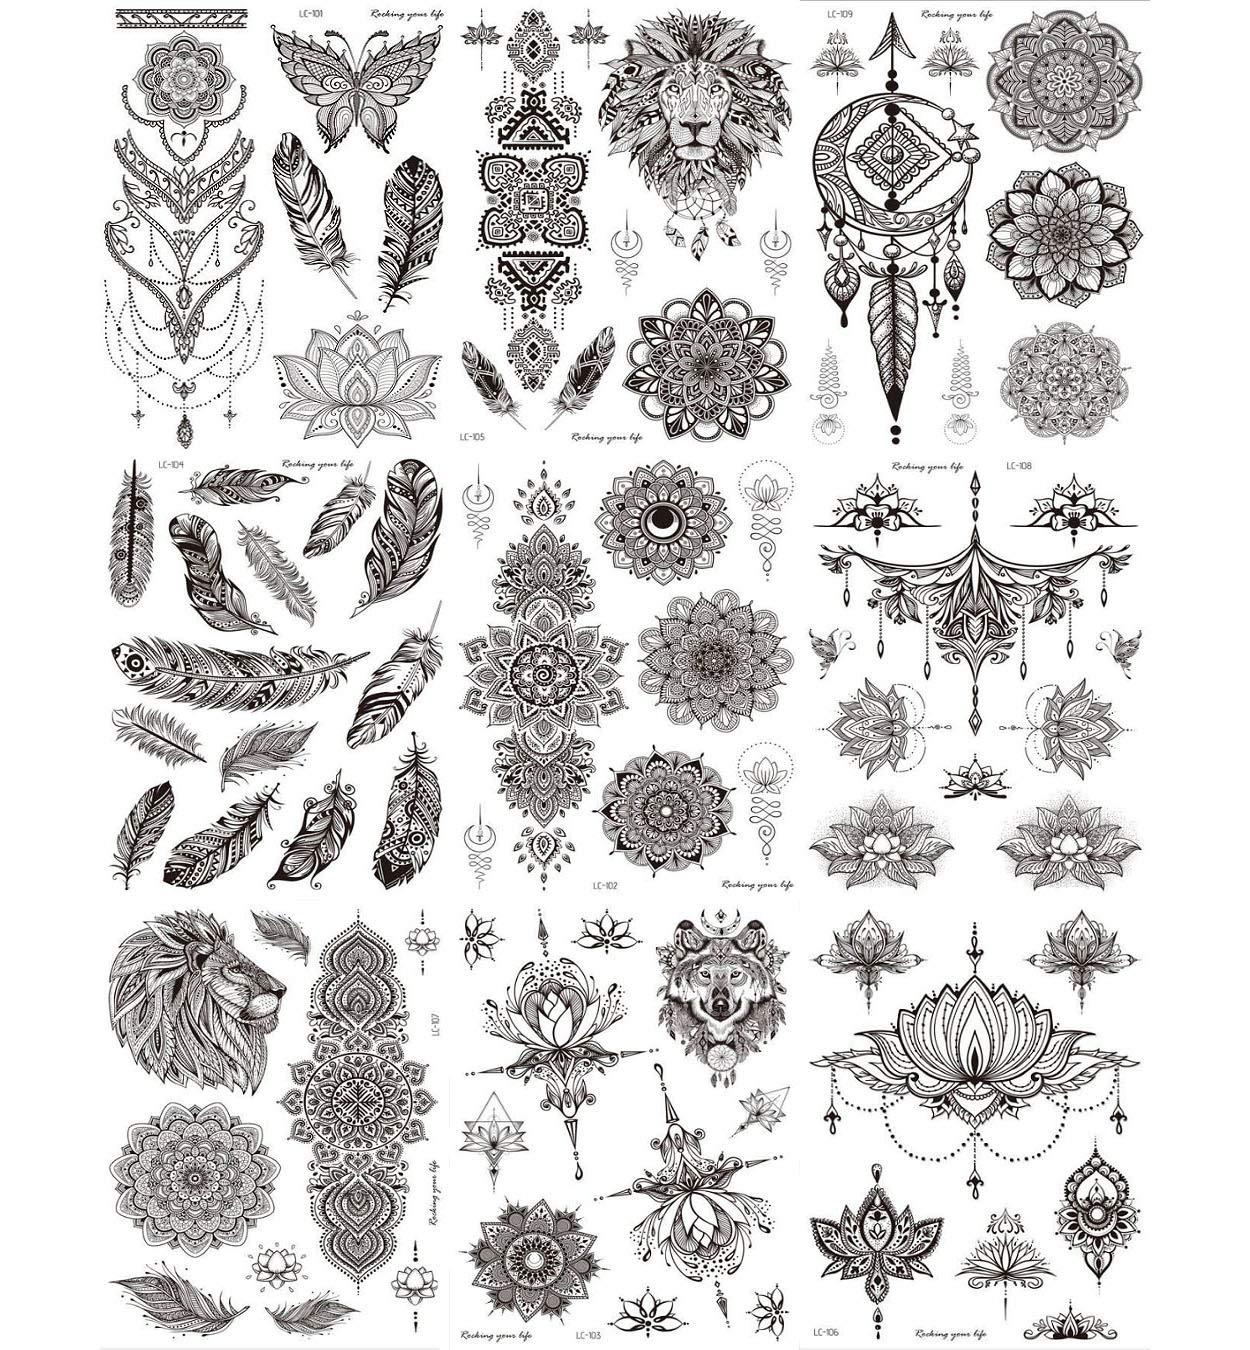 Temporary Tattoos Stickers, Ztent 9 Sheets Mandala Flower Body Art Stickers Waterproof Henna Black Art Tattoo Stickers For Adult Women Girls Body Art Arm